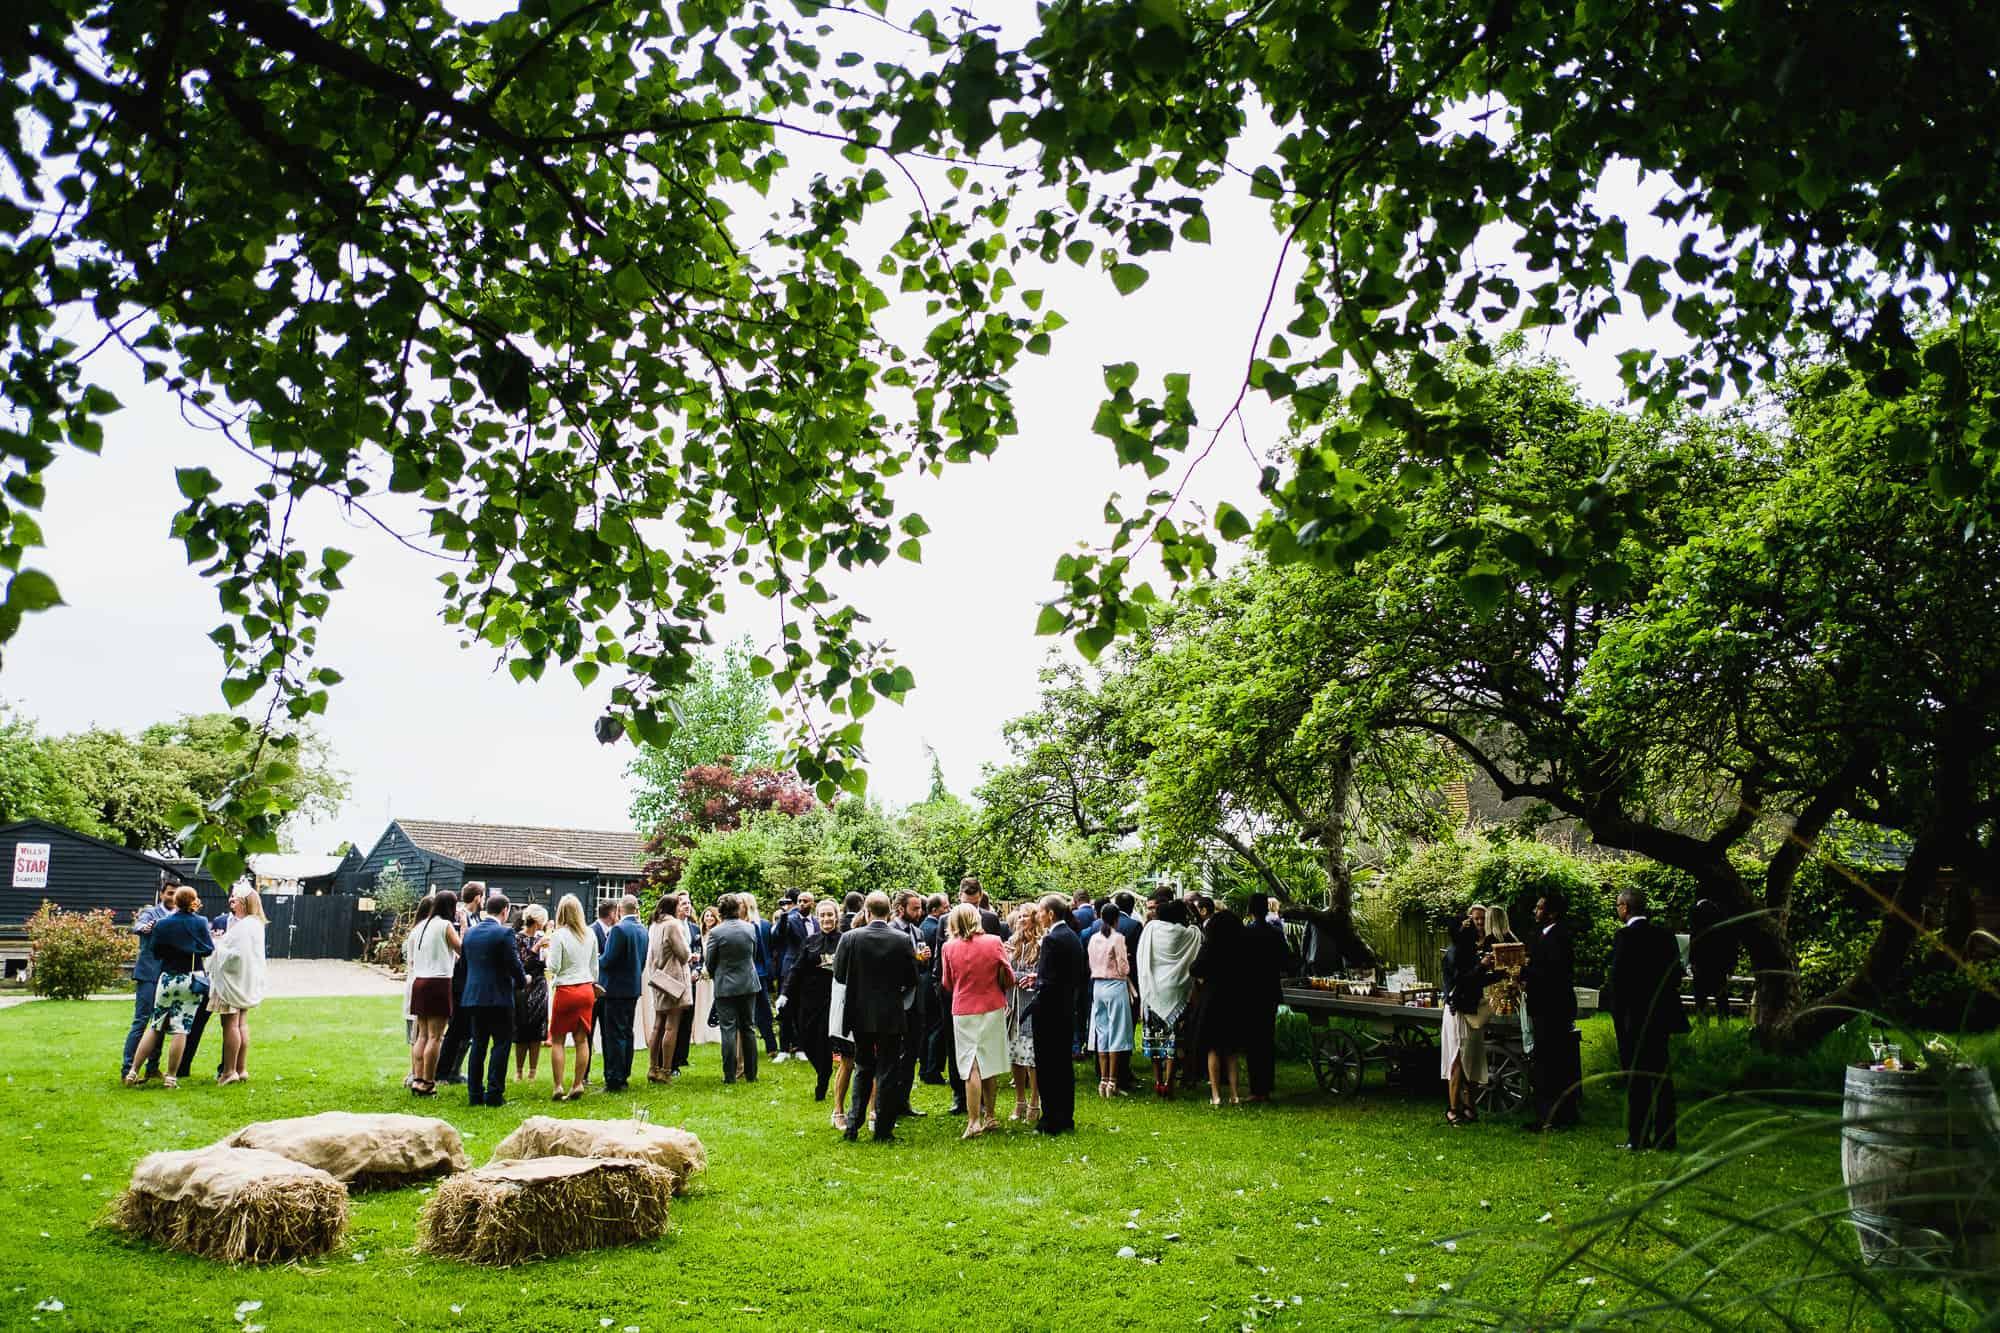 marleybrook-house-wedding-photography-matt-tyler-0037